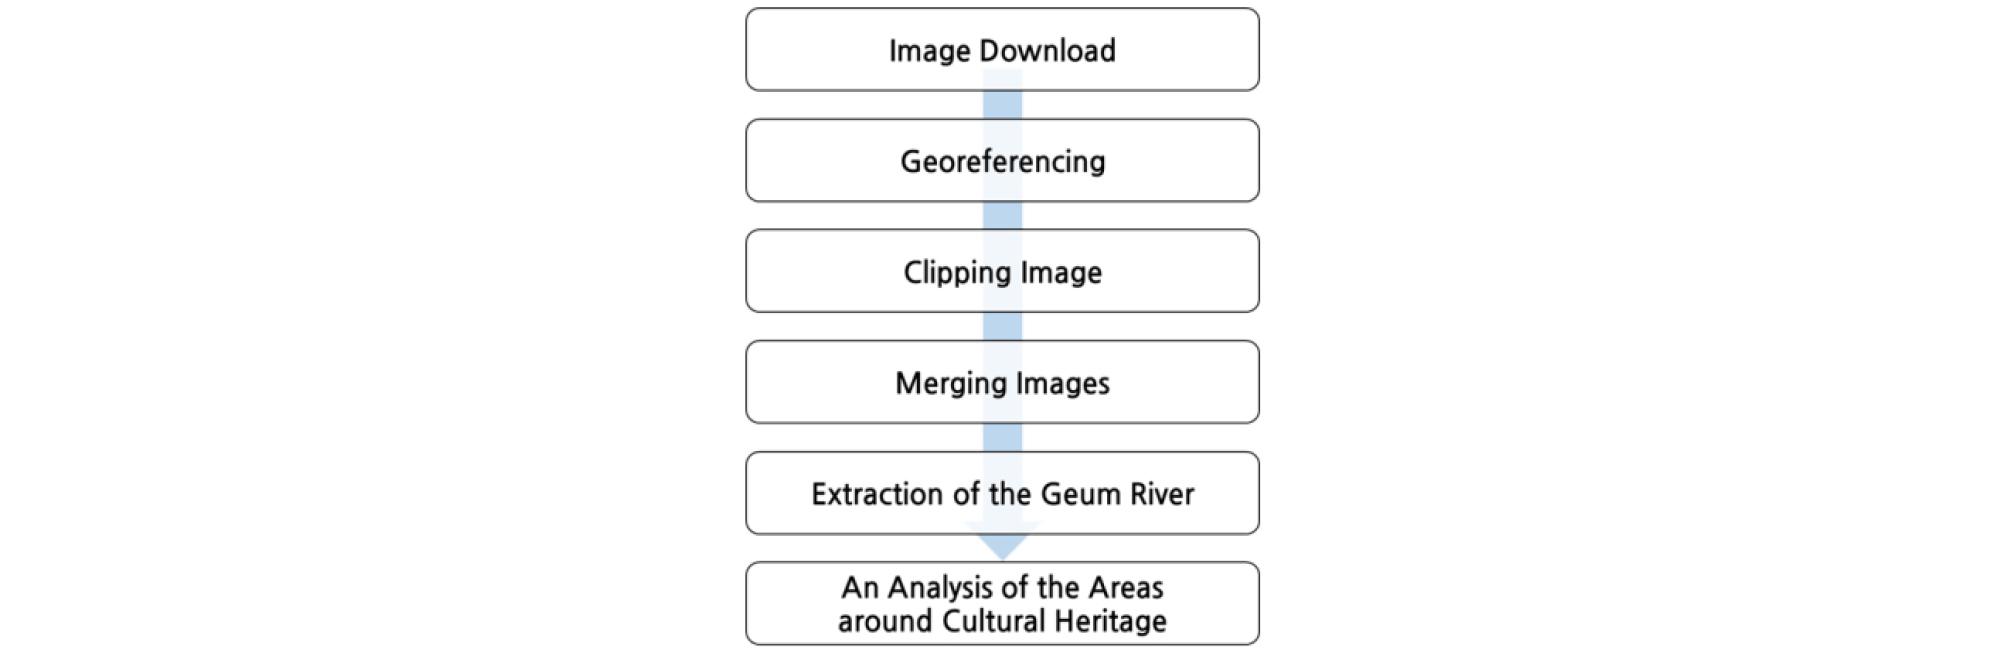 http://static.apub.kr/journalsite/sites/ksce/2019-039-06/N0110390629/images/Figure_KSCE_39_06_29_F6.jpg